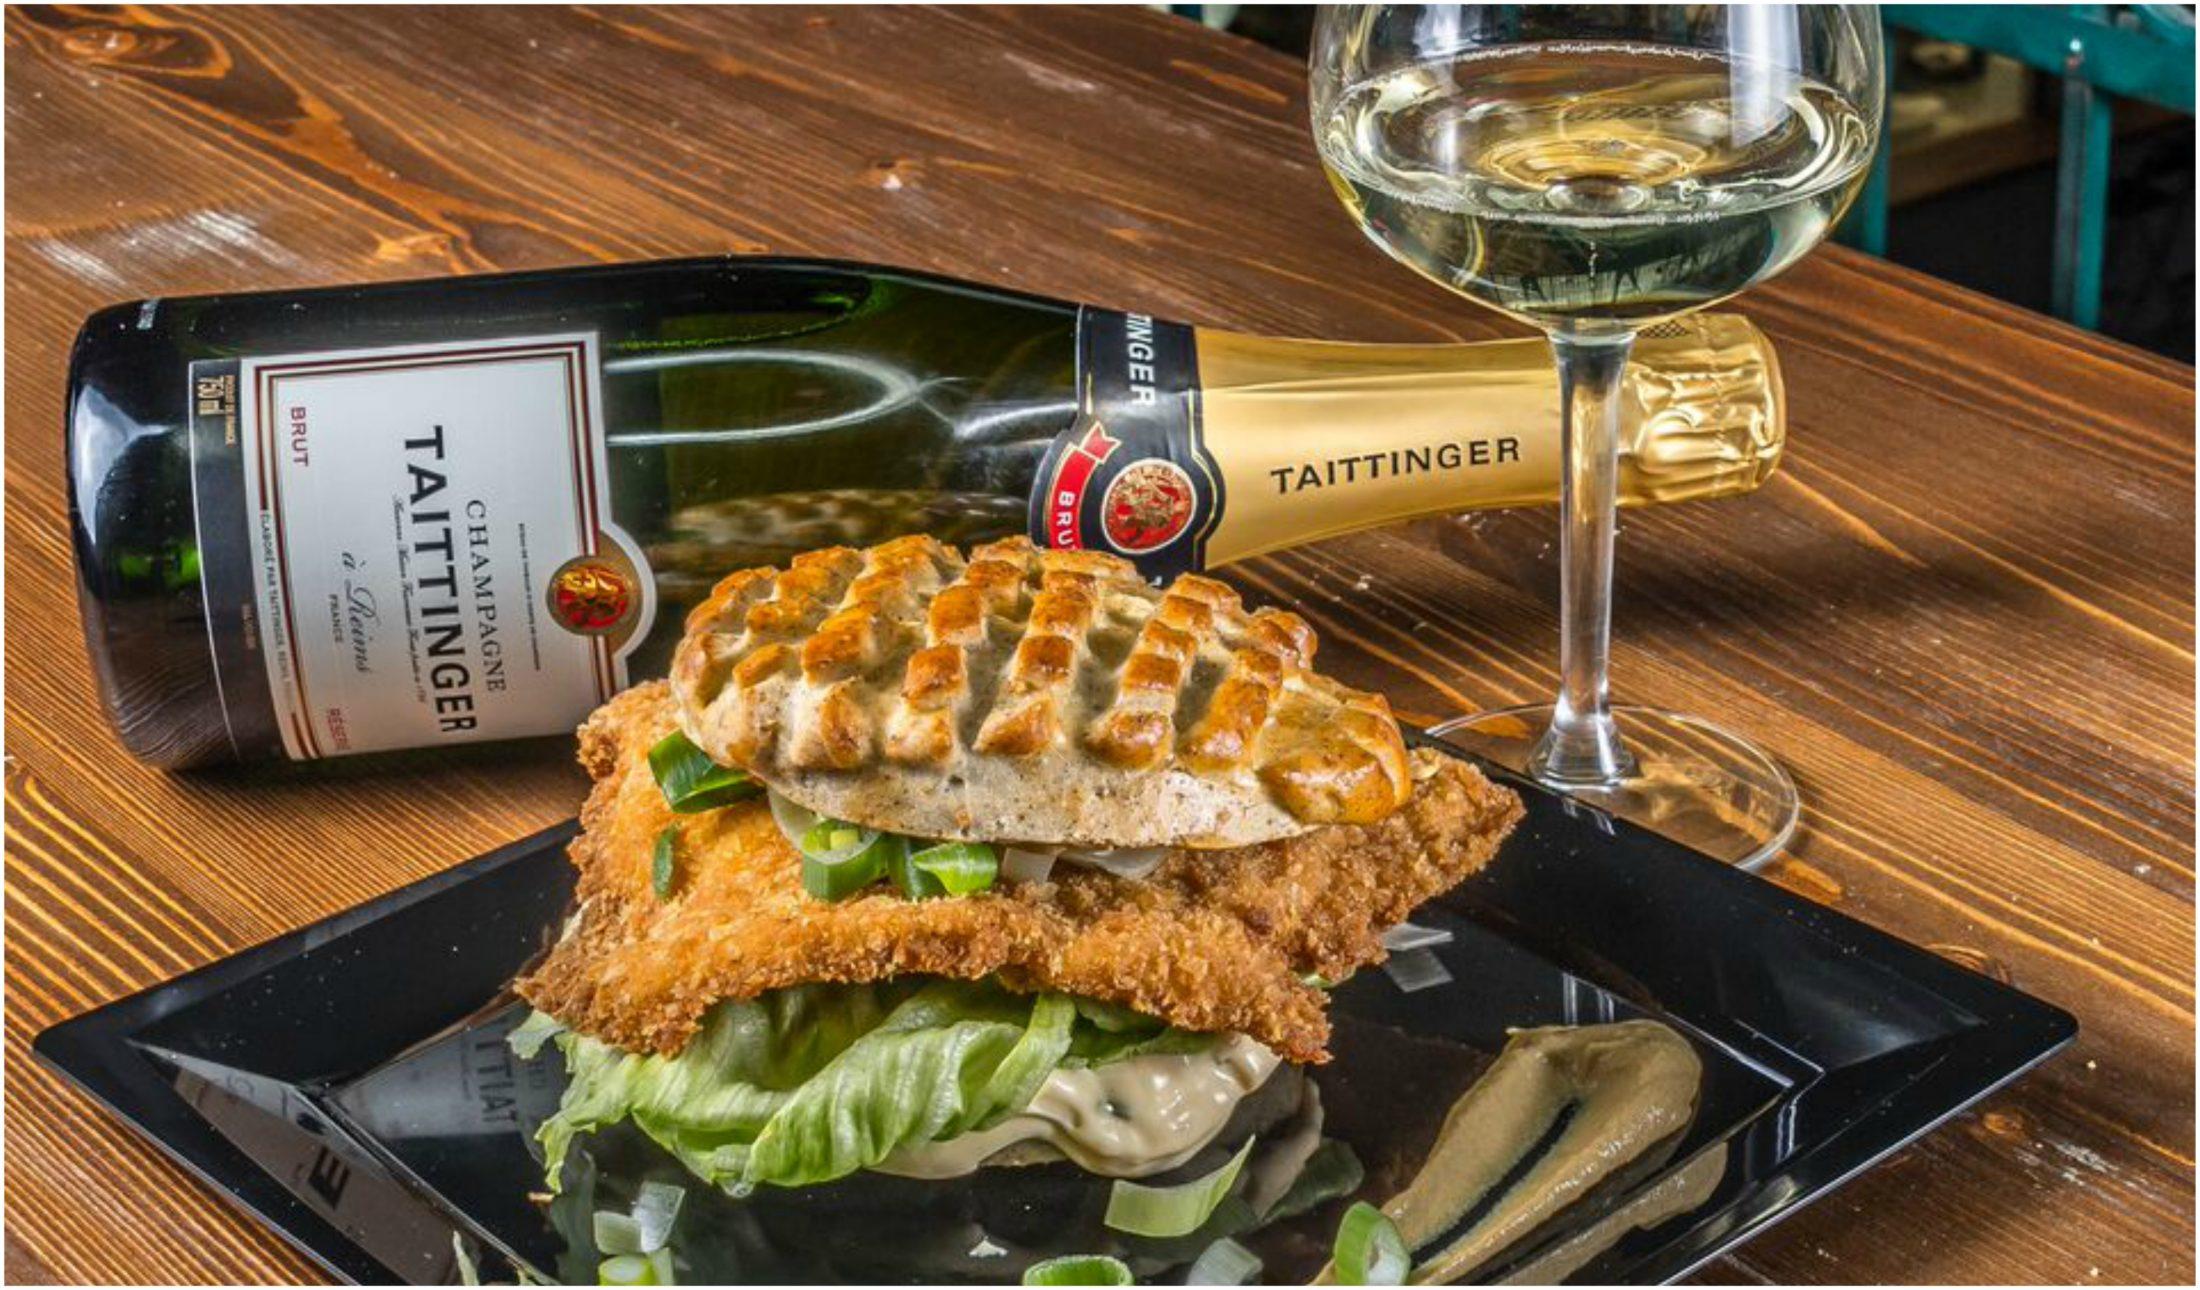 Buborékos holdraszállás: Íme, a VinCE Champagne a Holdon idei menüsora! - Dining Guide